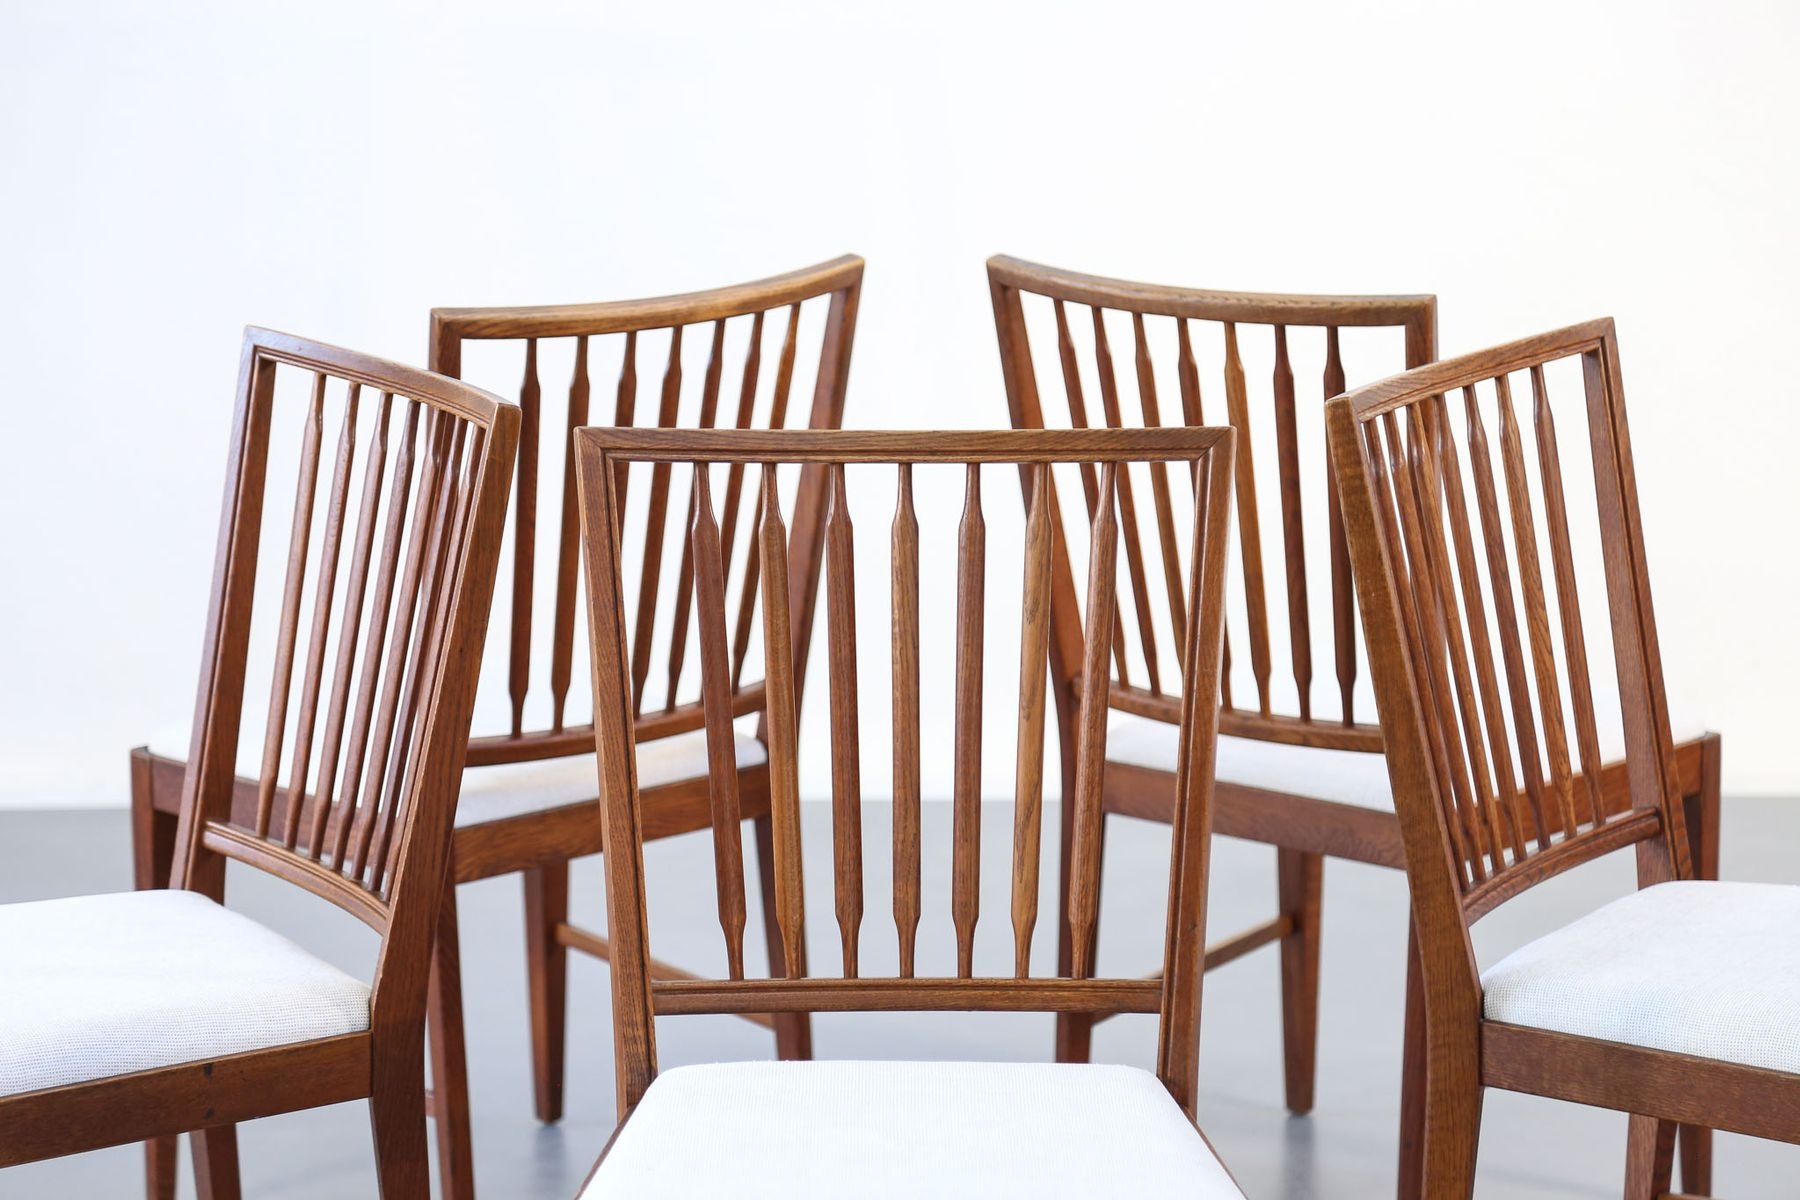 skandinavische st hle aus teak 1960er 5er set bei pamono kaufen. Black Bedroom Furniture Sets. Home Design Ideas